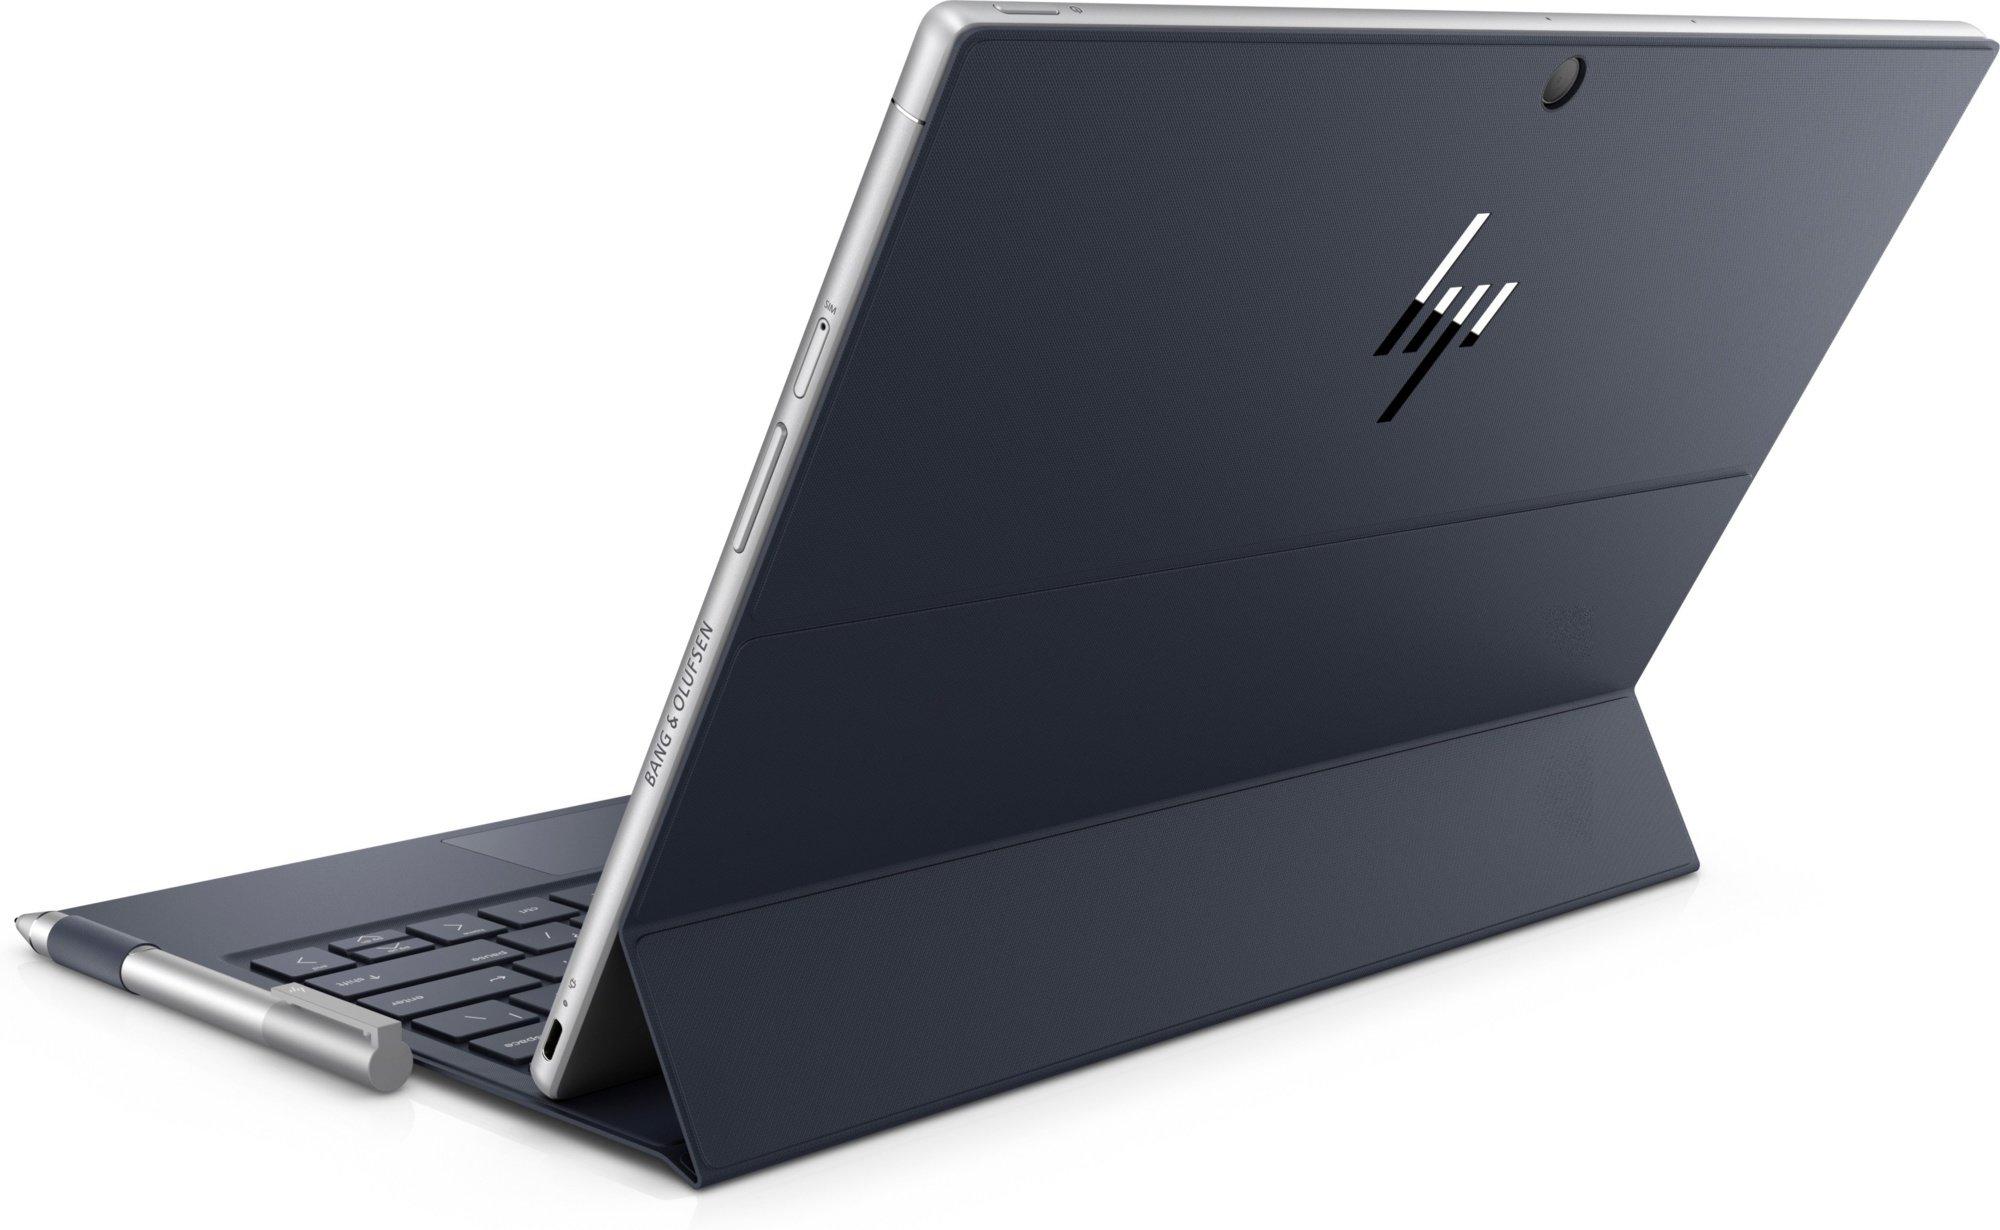 HP Envy x2 12-g003nx